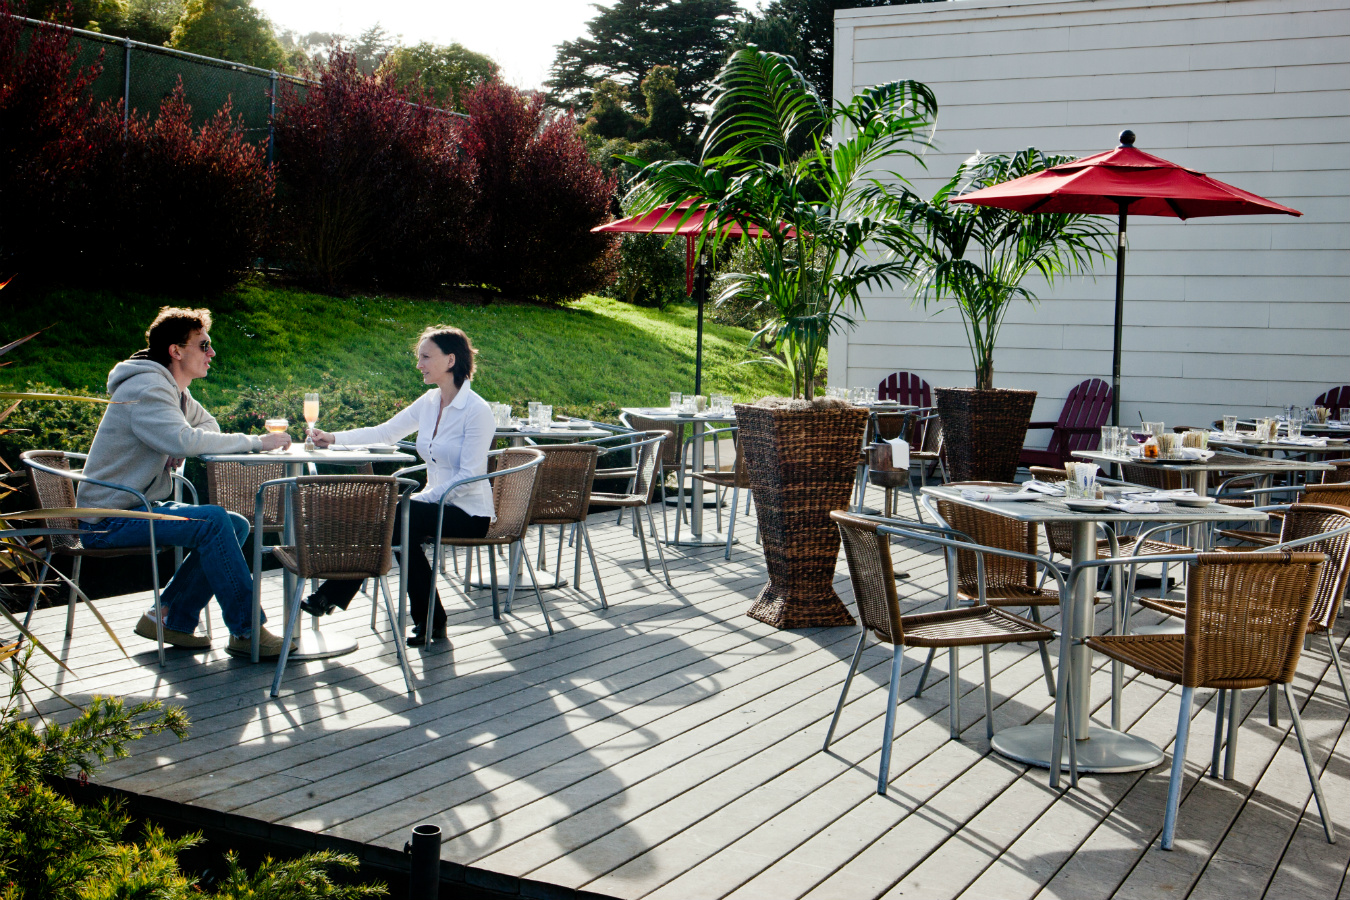 100 Presidio Social Club San Francisco Restaurants For Easter In San Francisco And The